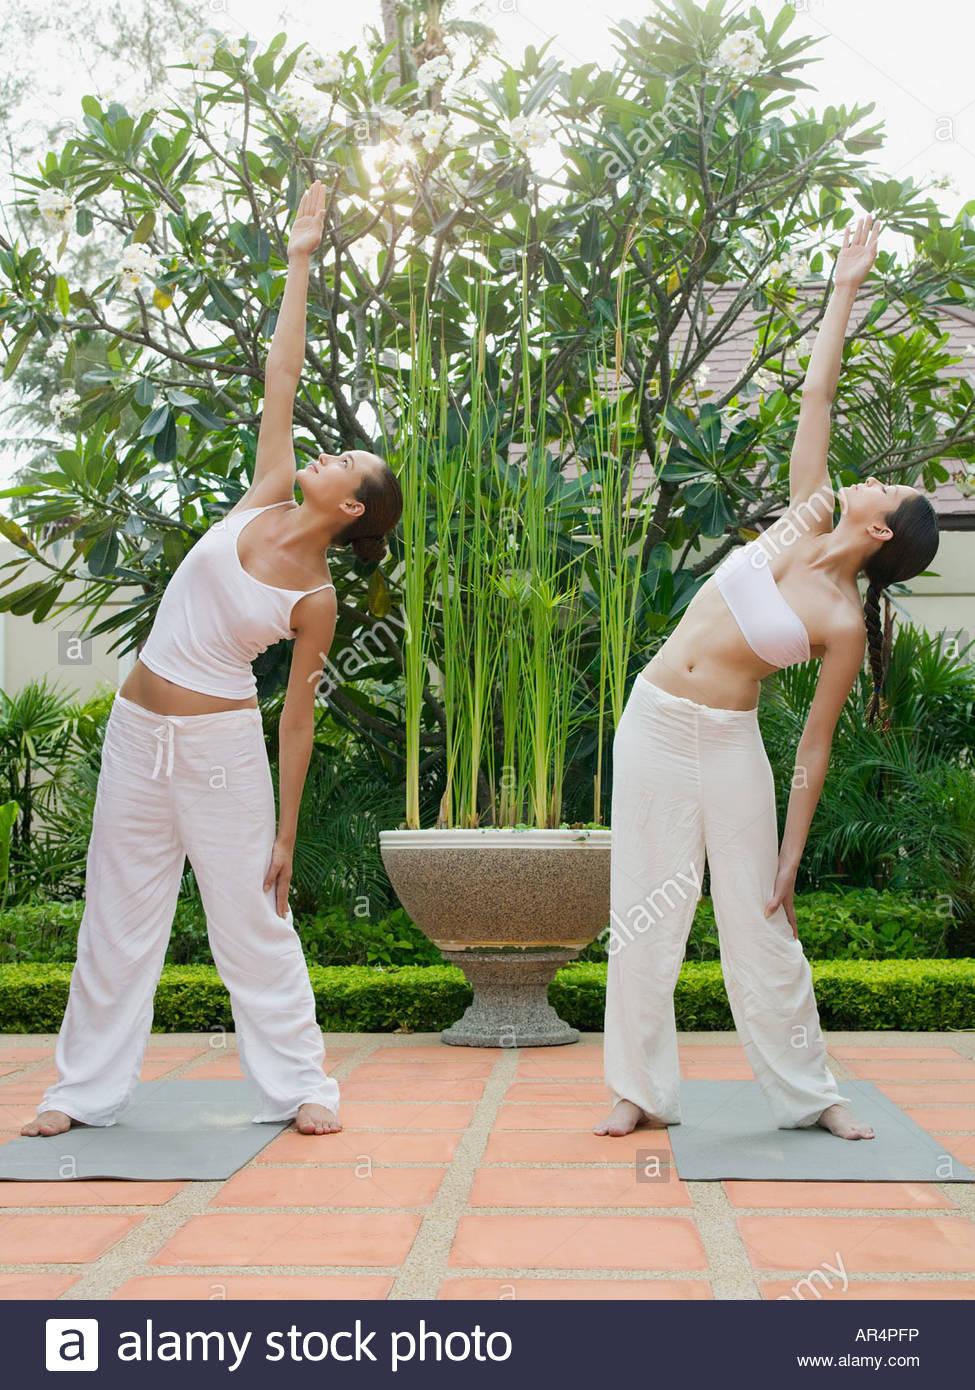 Two women practising yoga - Stock Image